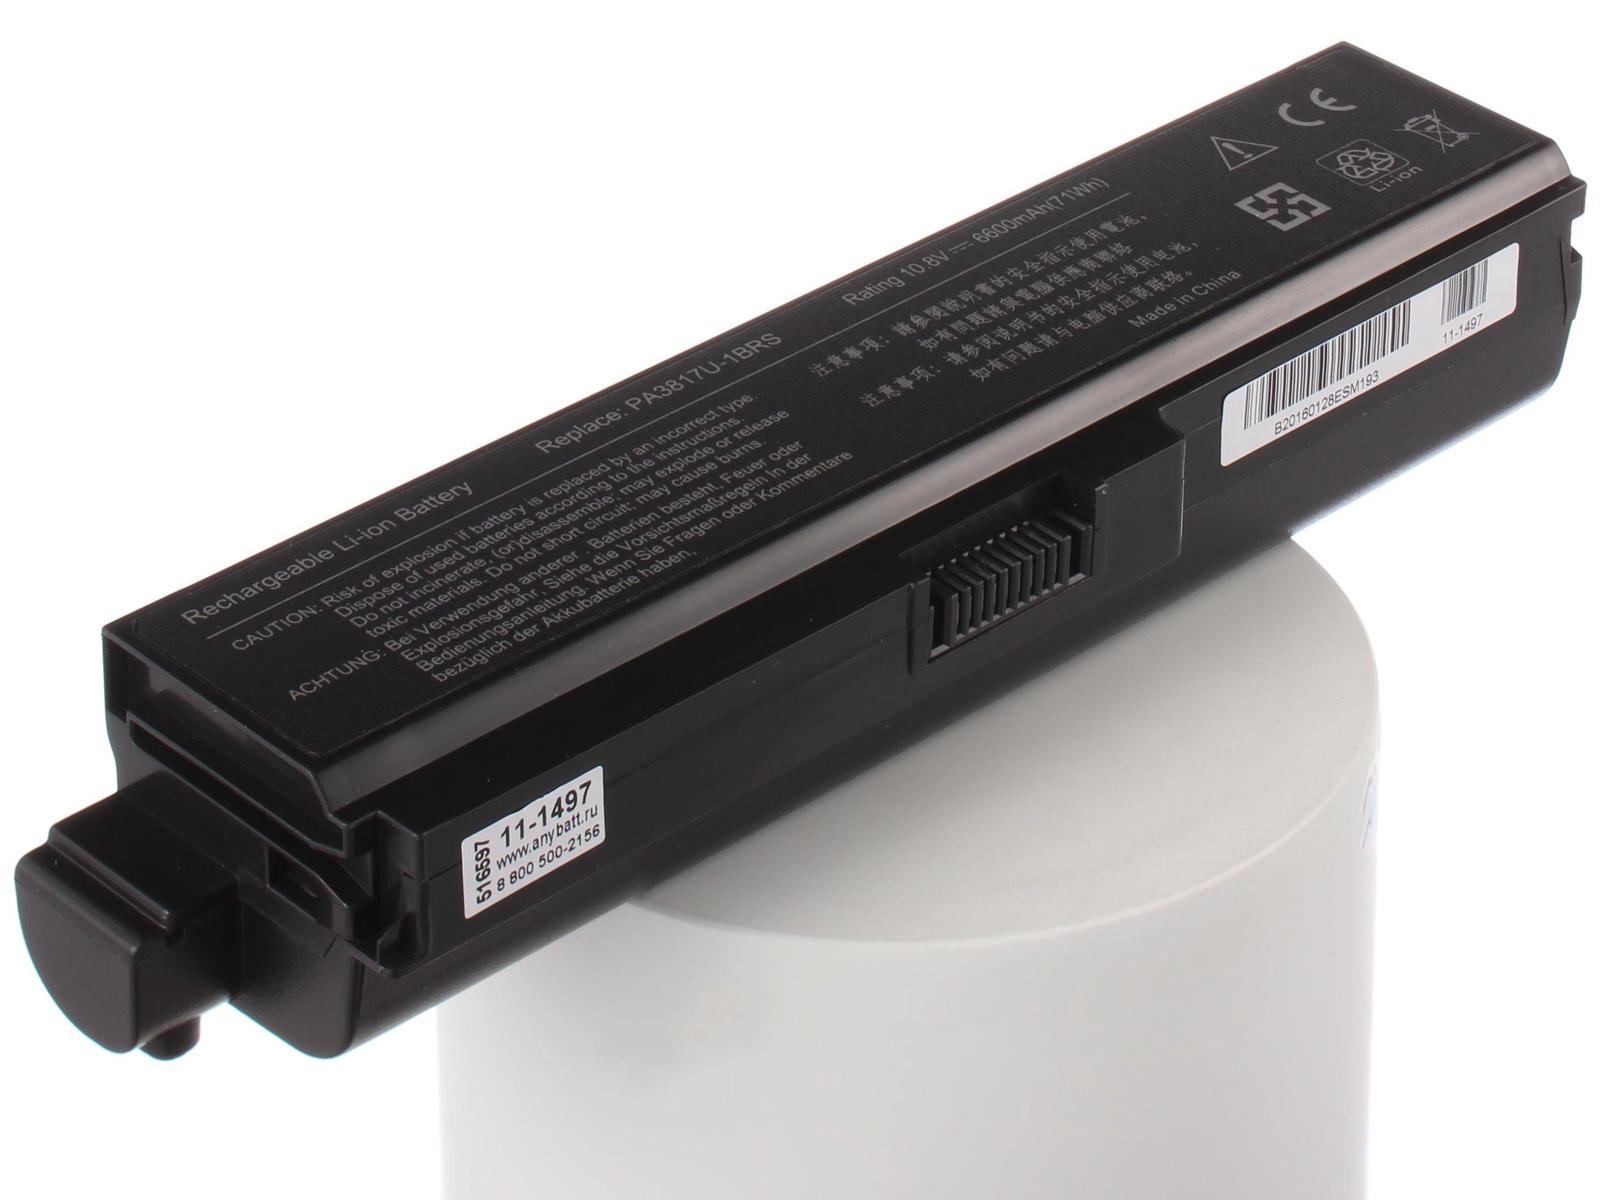 Аккумулятор для ноутбука AnyBatt для ToshiBa Satellite A665-S6058, Satellite L600D, Satellite L645-S4038, Satellite L635-12Q, Satellite L675D-S7015, Satellite A665 Series, Satellite L630-14M, Satellite L635-10W, Satellite L640